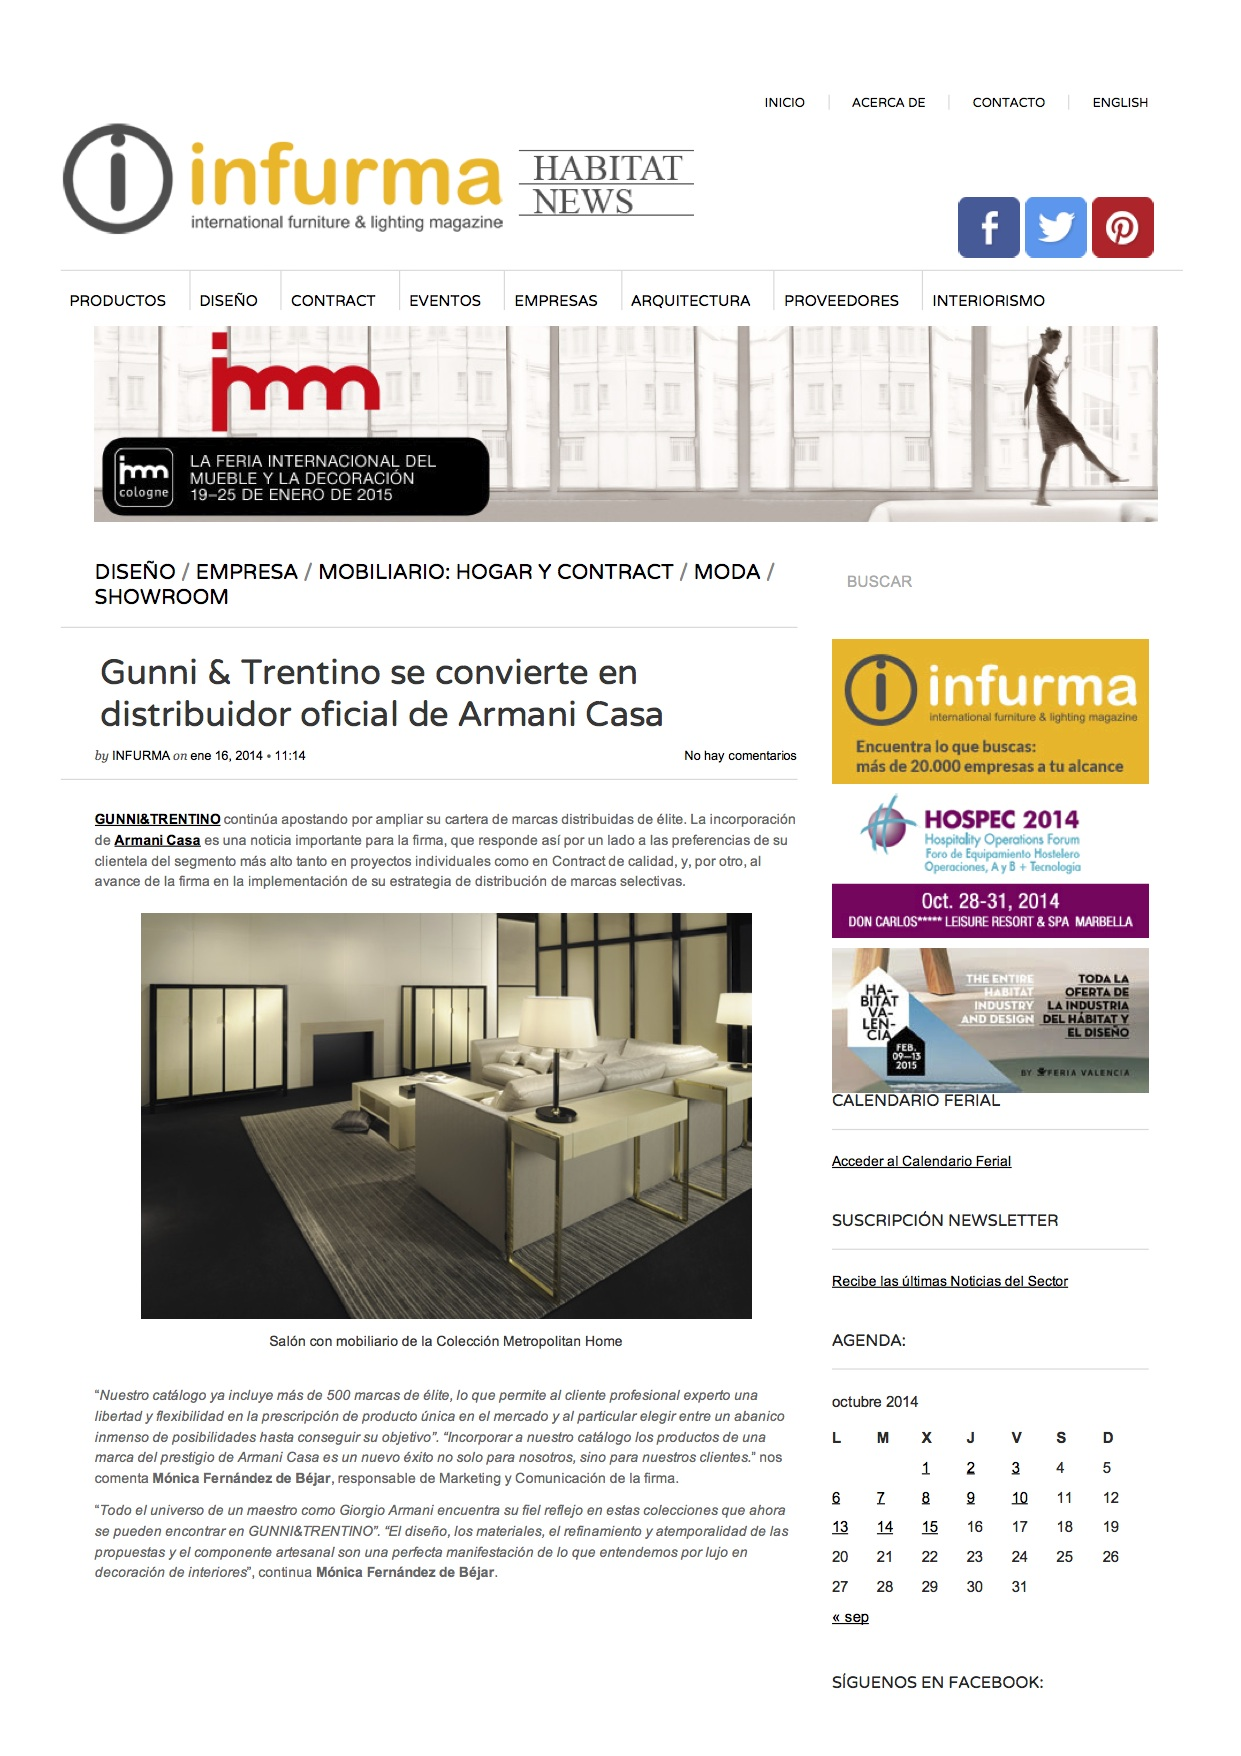 , Infurma HABITAT NEWS enero 2014, Gunni & Trentino